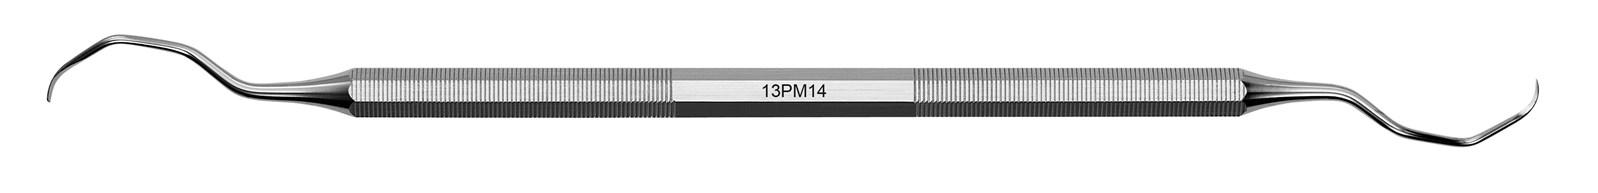 Kyreta Gracey Mini - 13PM14, ADEP červený